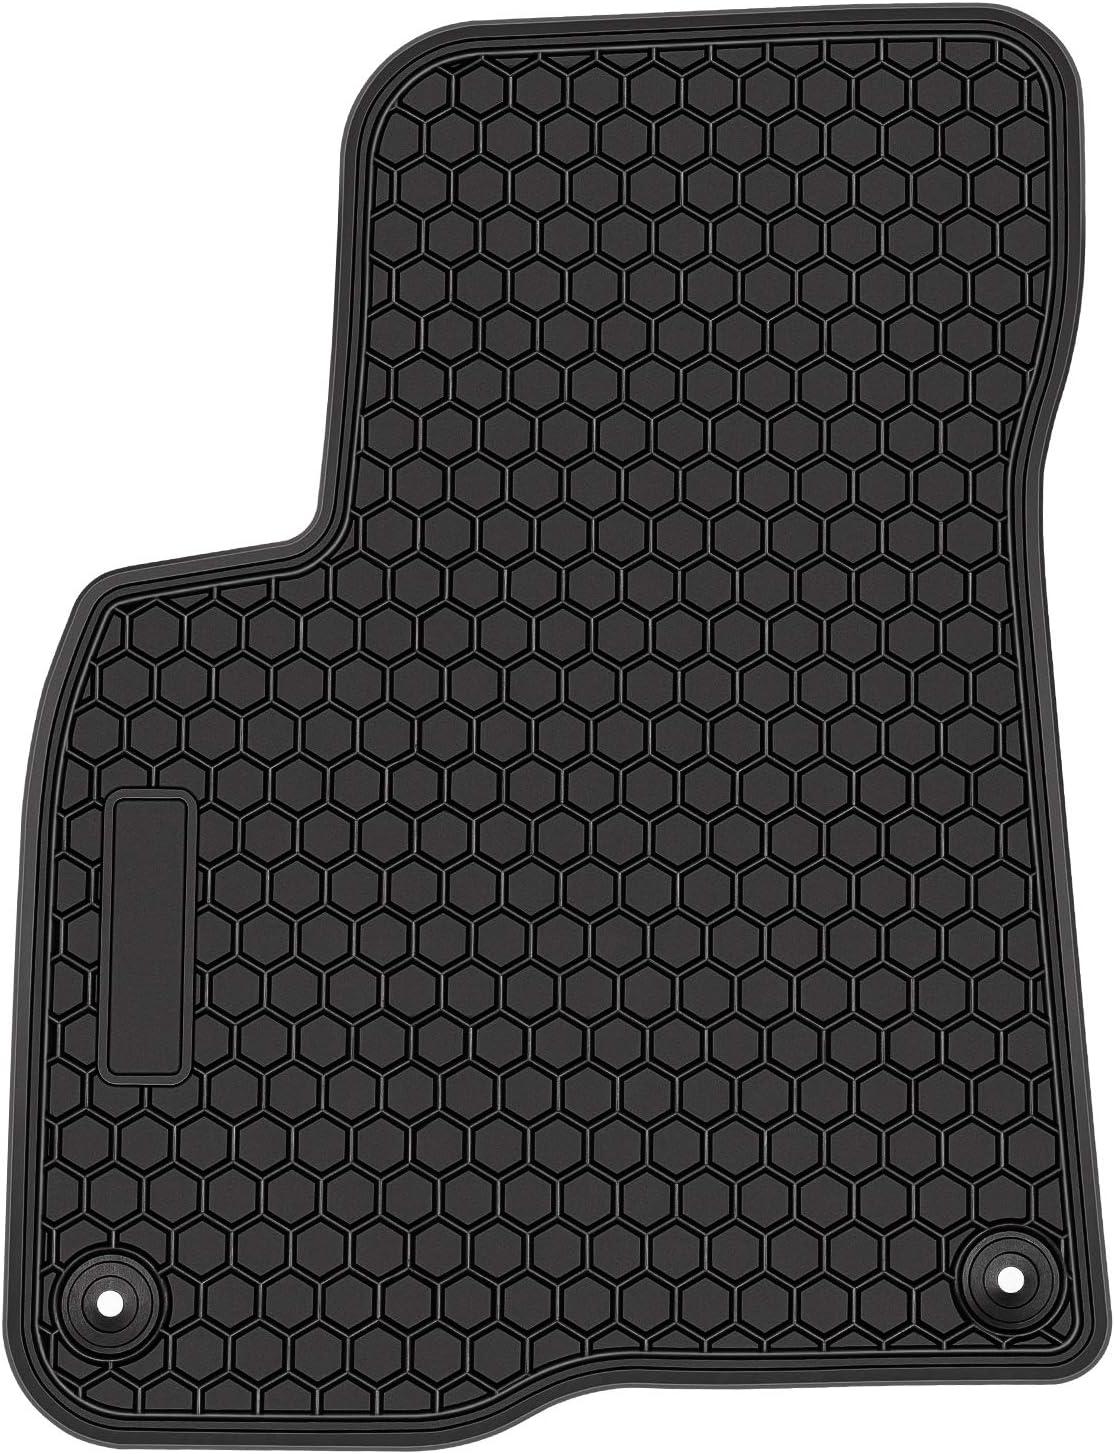 All Seasons Odorless E-cowlboy Floor Mat Liner for Honda CR-V 5th 2017~2019 Heavy Duty Rubber Front /& Rear Car Carpet Custom Fit Black